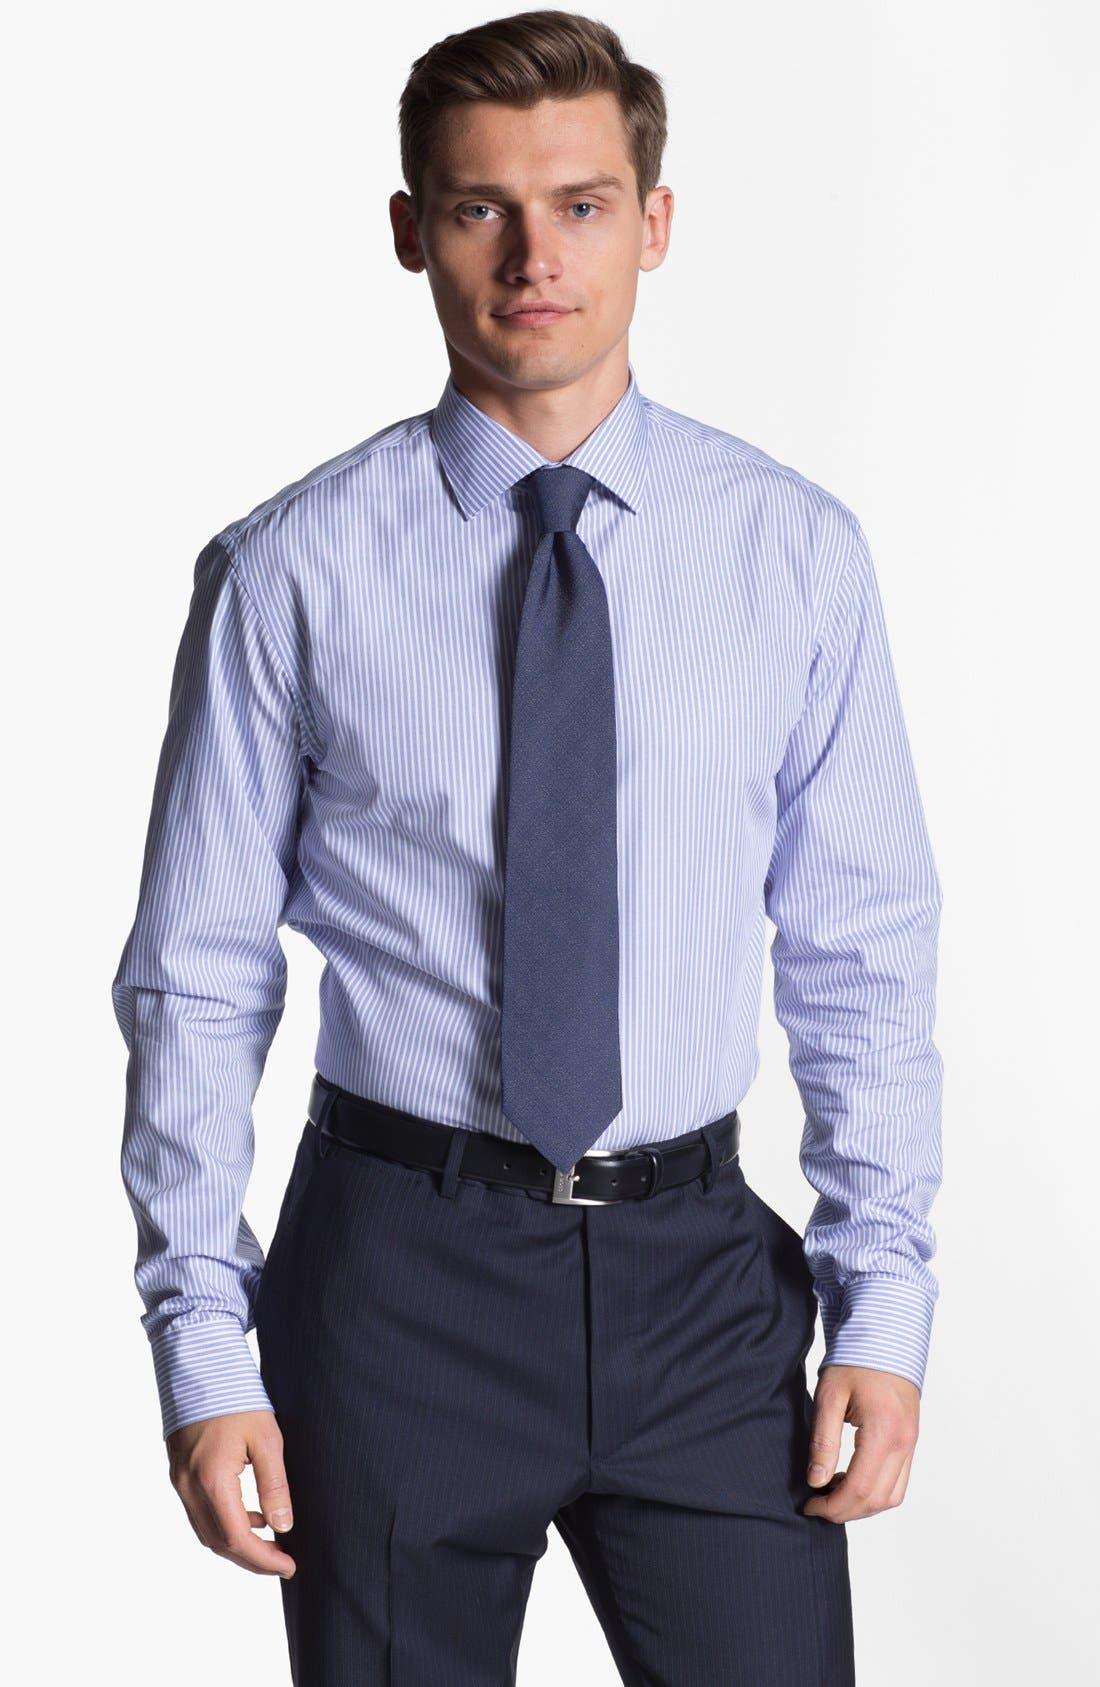 Alternate Image 1 Selected - Armani Collezioni Trim Fit Stripe Cotton Dress Shirt